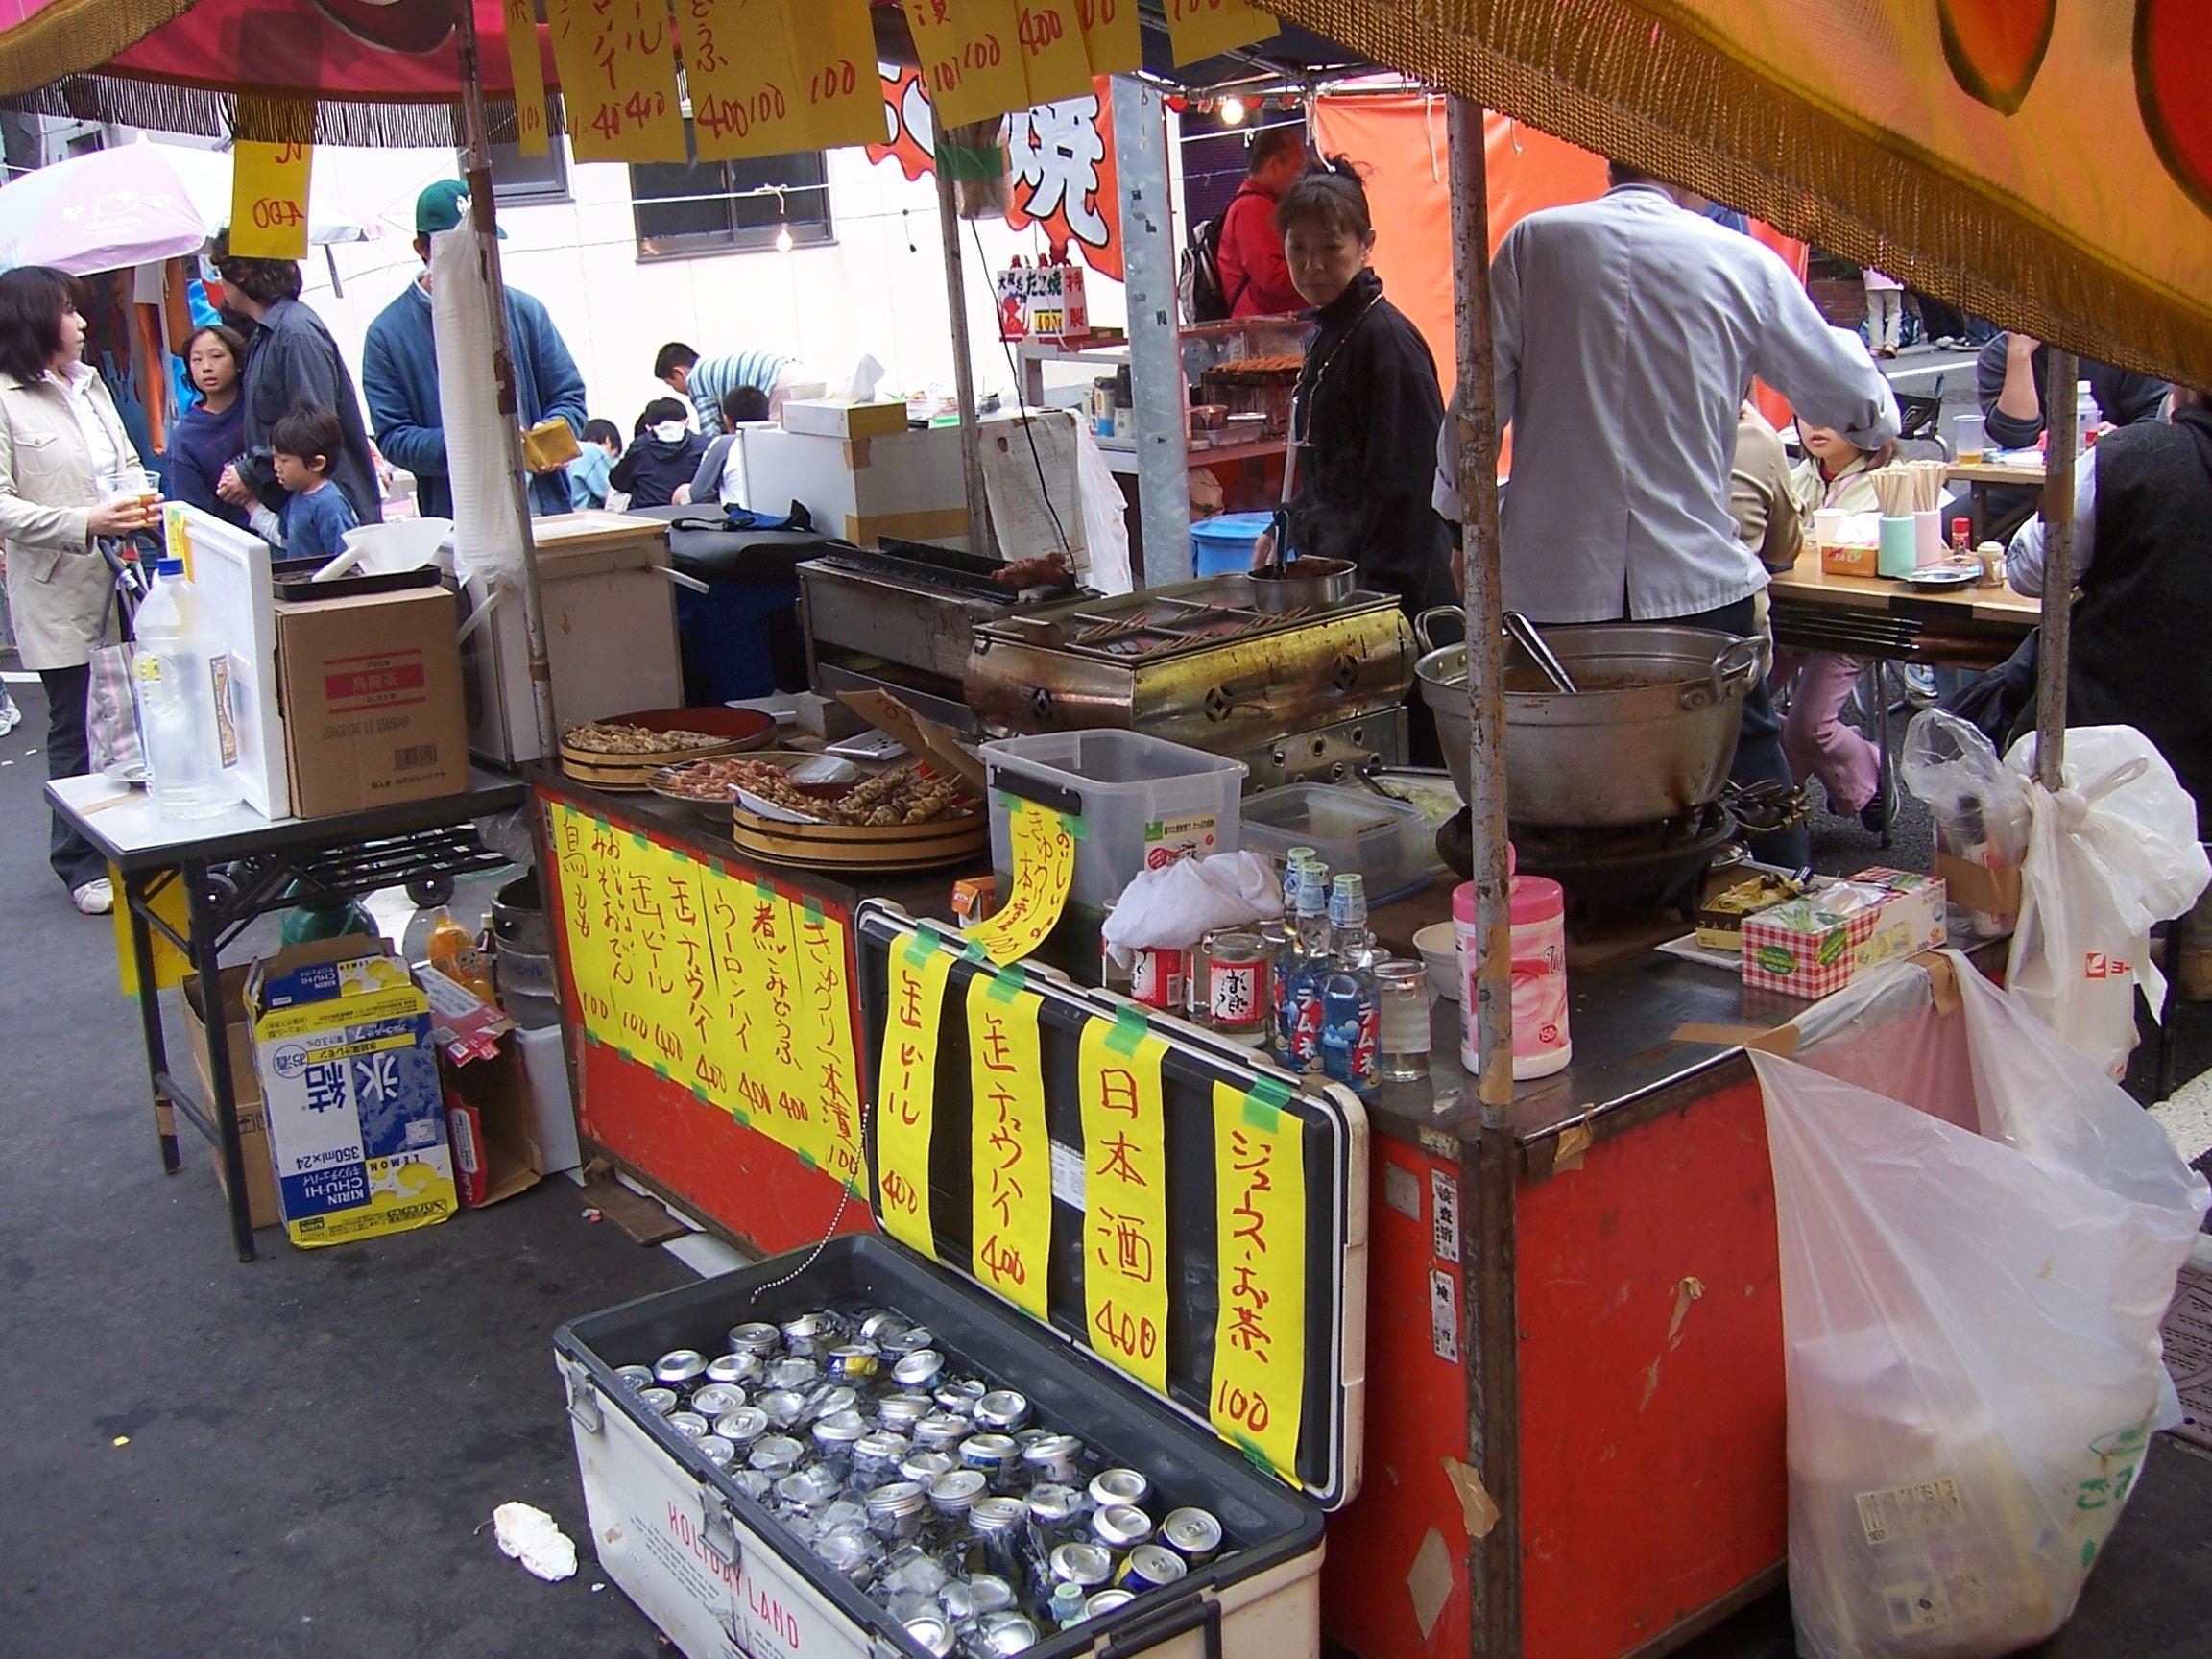 Simbolos Magicos Y Antiguos 30 Pinceles besides Parodiando Deja Dos Muertos in addition C  m additionally  besides Restaurantefuentelalloba blogspot. on de la fuente